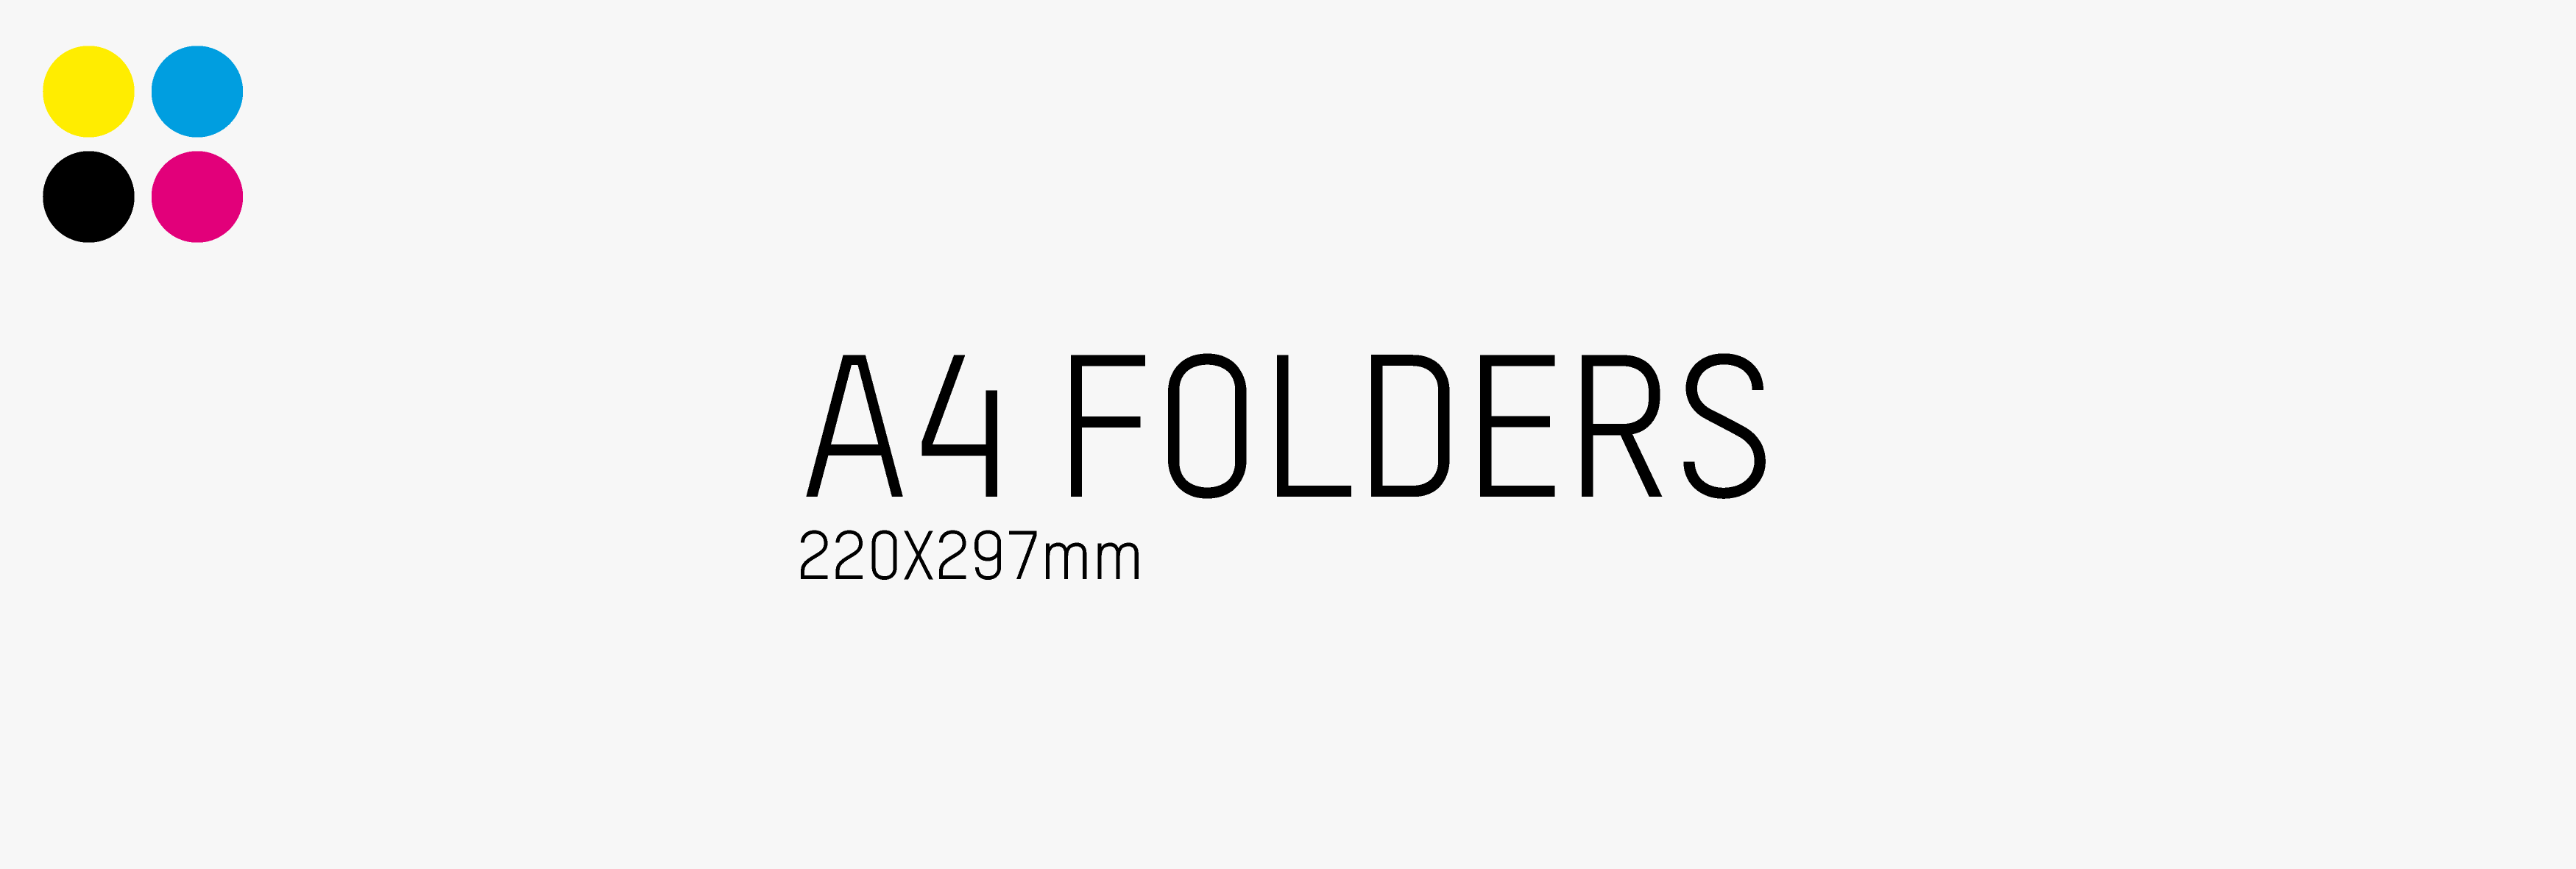 A4-folders